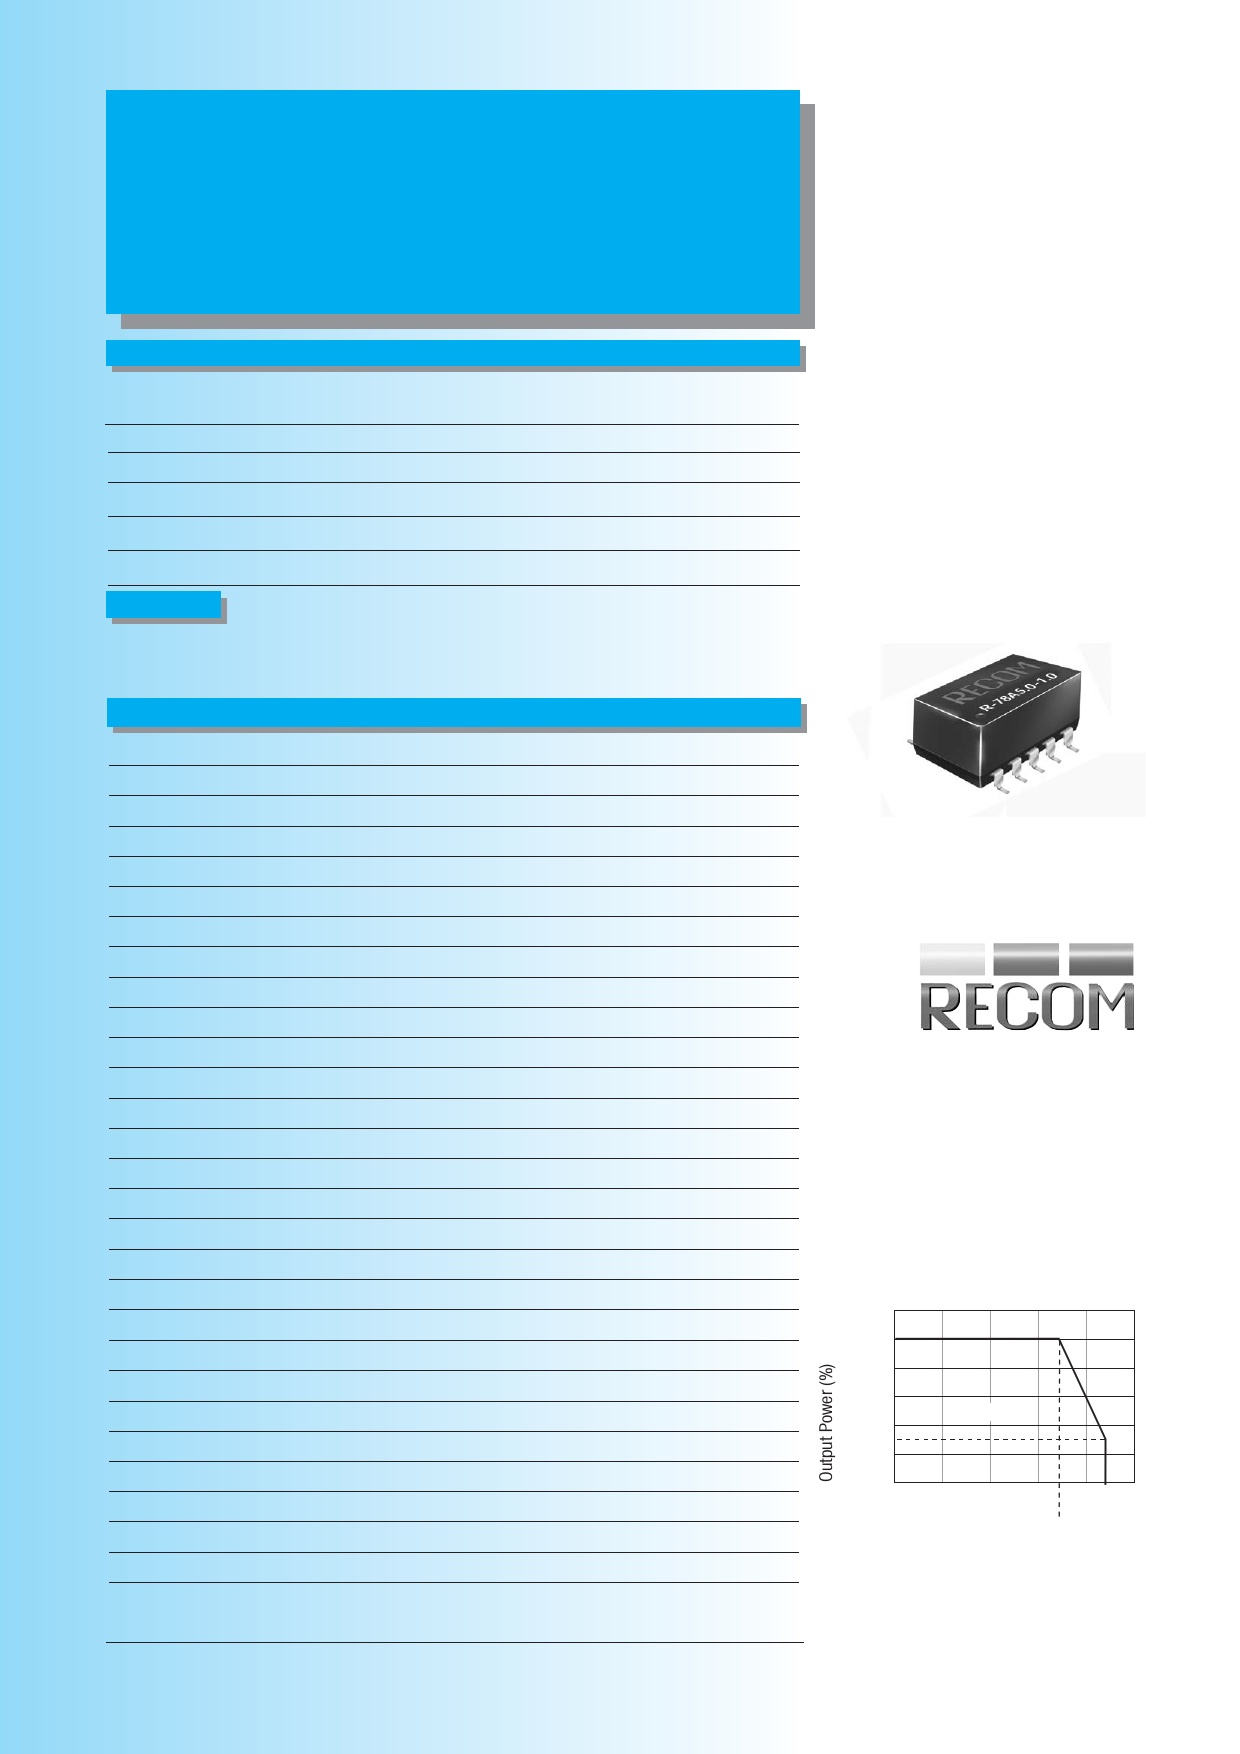 R-78A1.8-1.0SMD دیتاشیت PDF